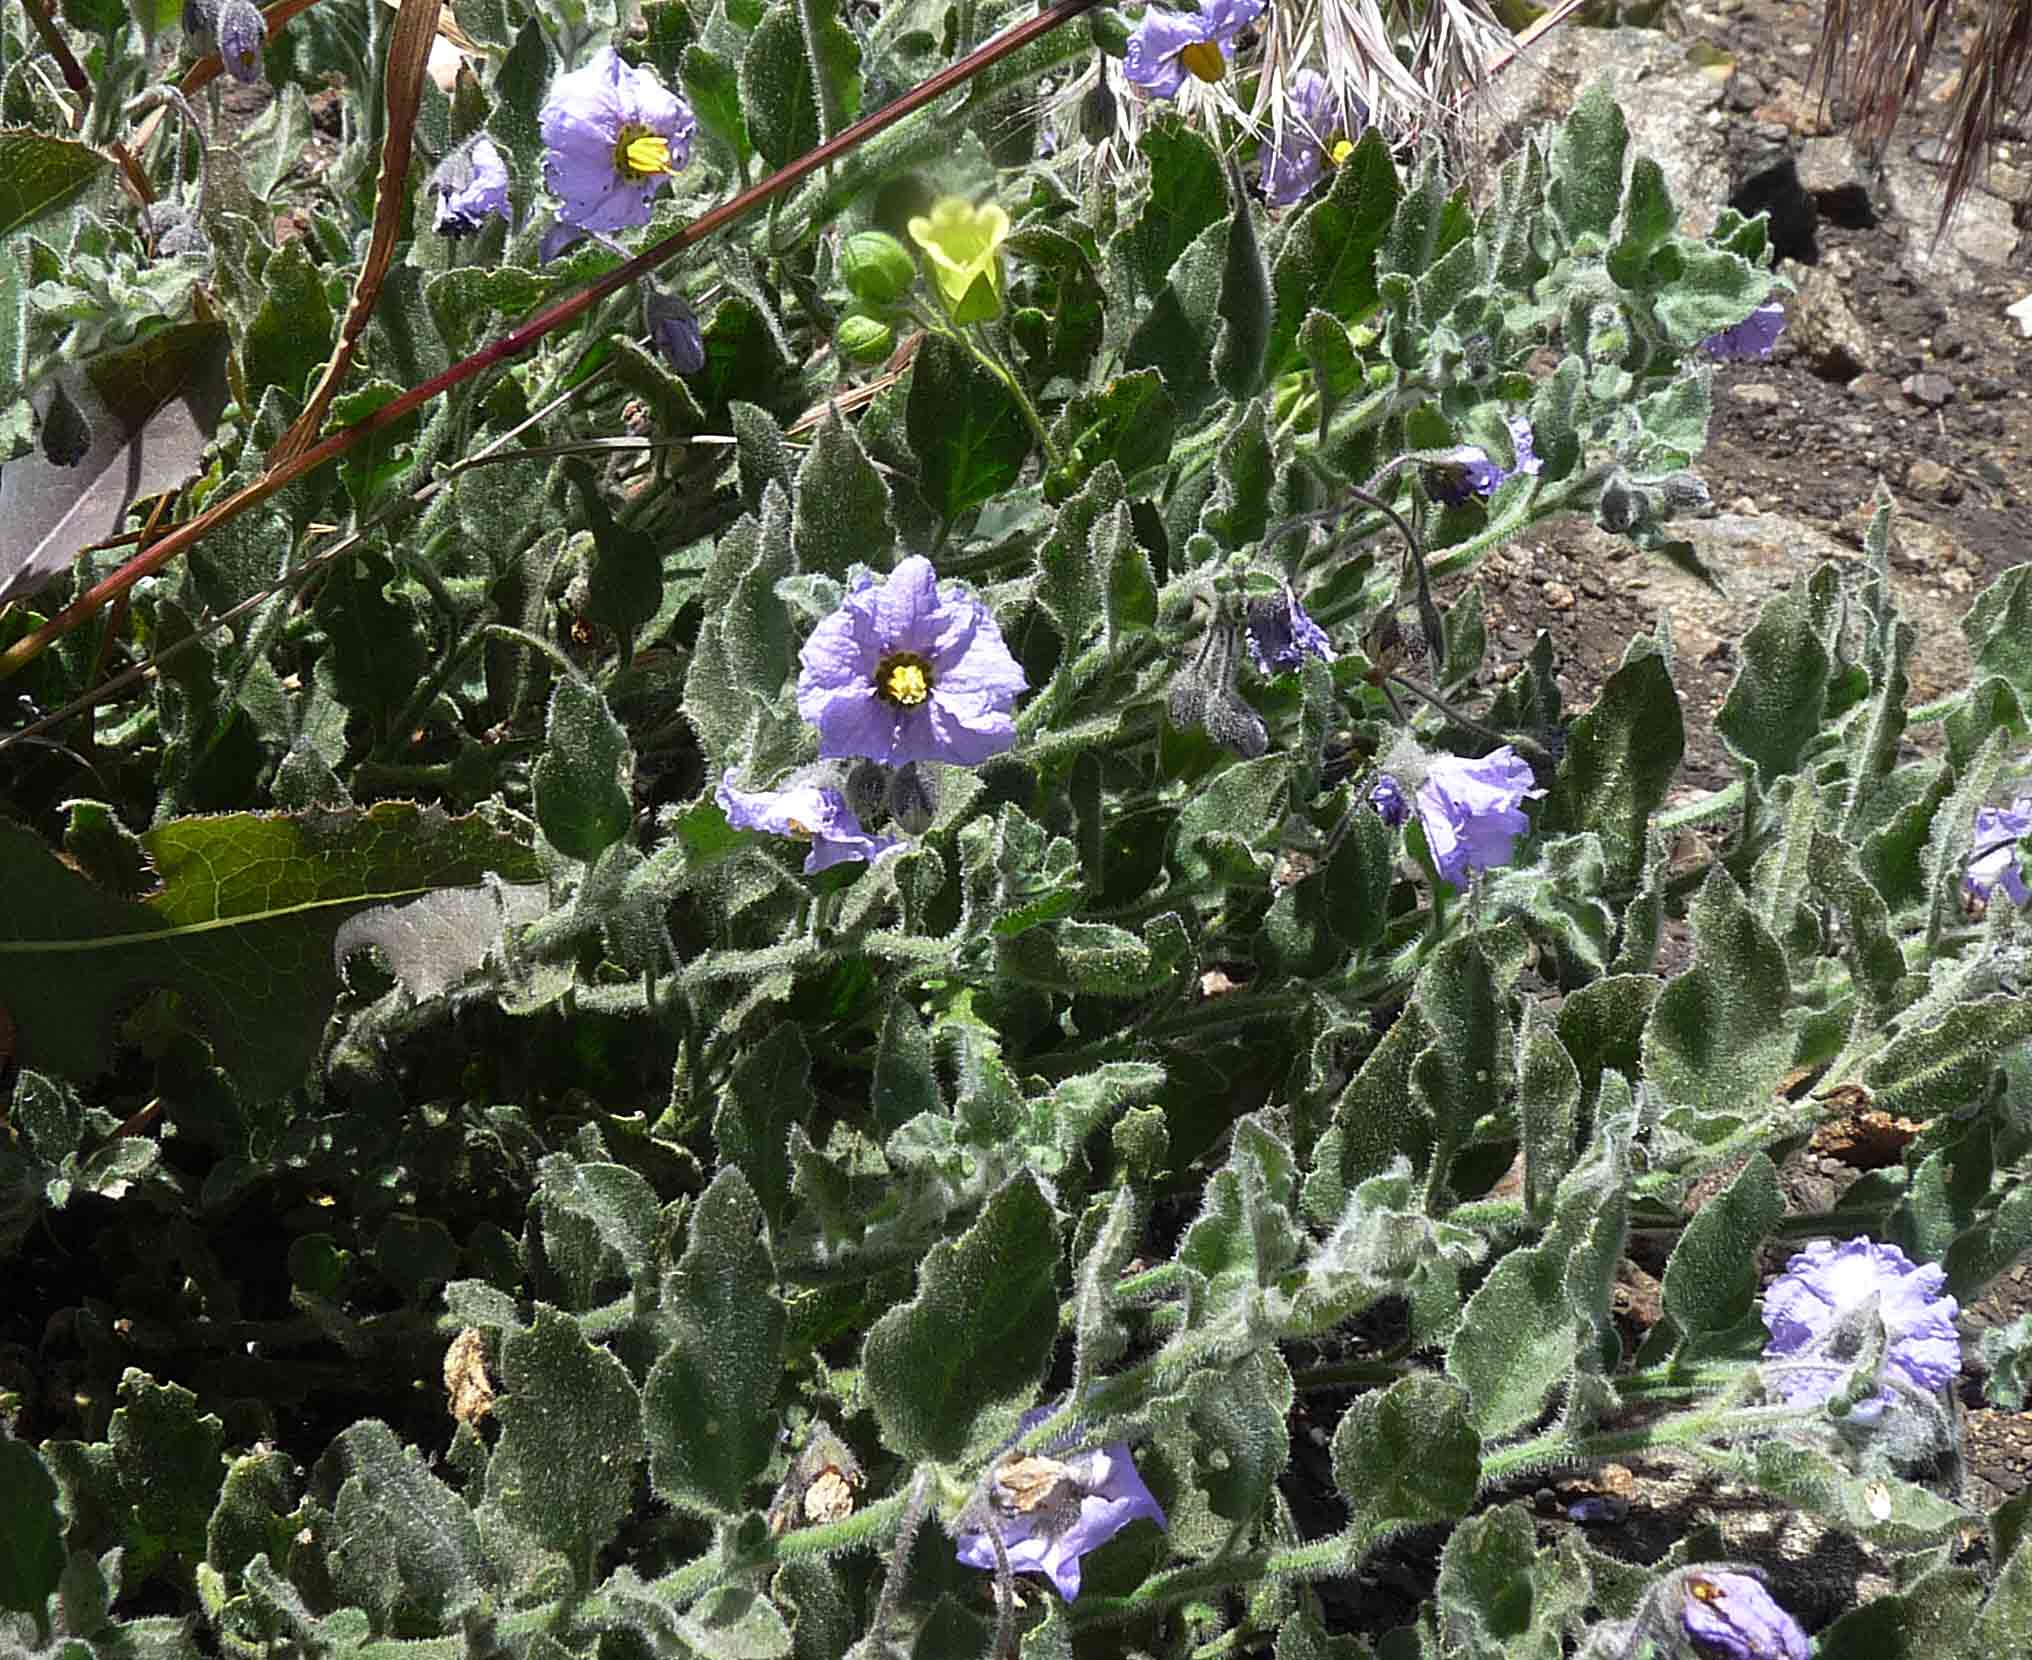 Purple Nightshade, Solanum xanti